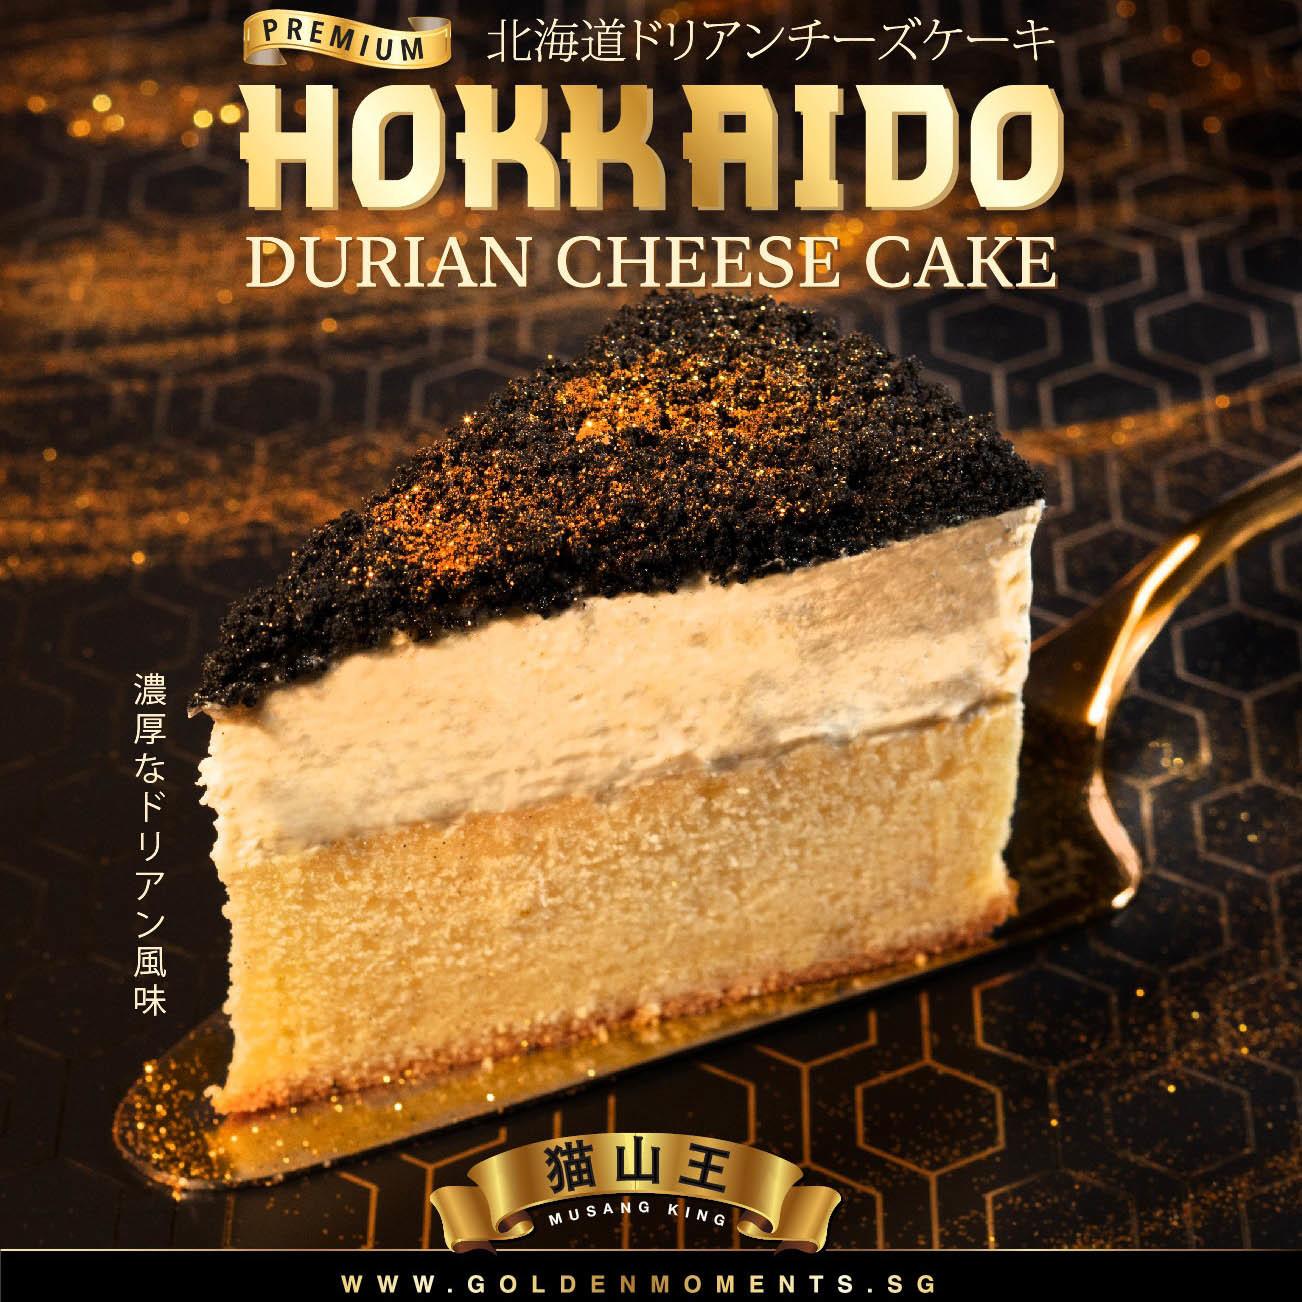 Golden MomentsPremium Hokkaido Durian Cheesecake (Bundle of 19 Slices)